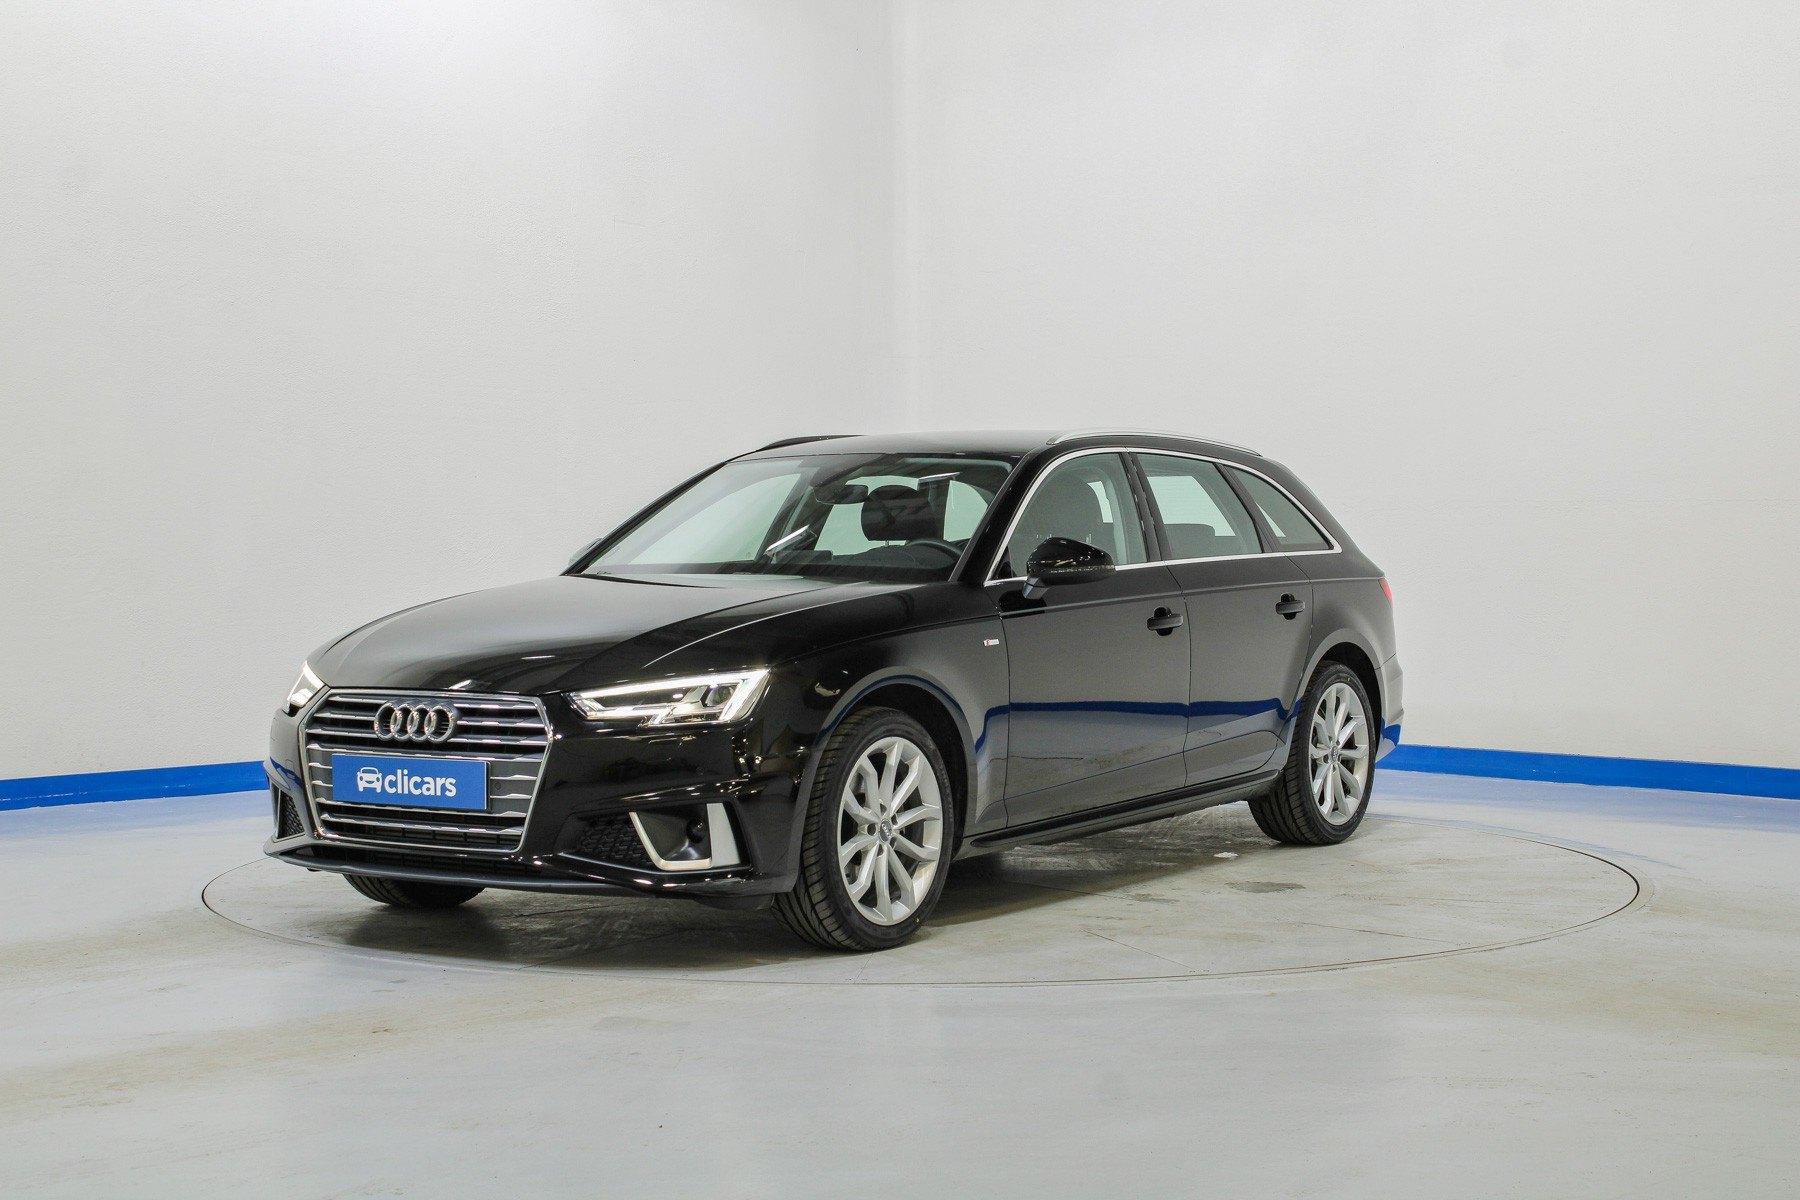 Audi A4 Gasolina Avant S line 35 TFSI 110kW S tronic 1